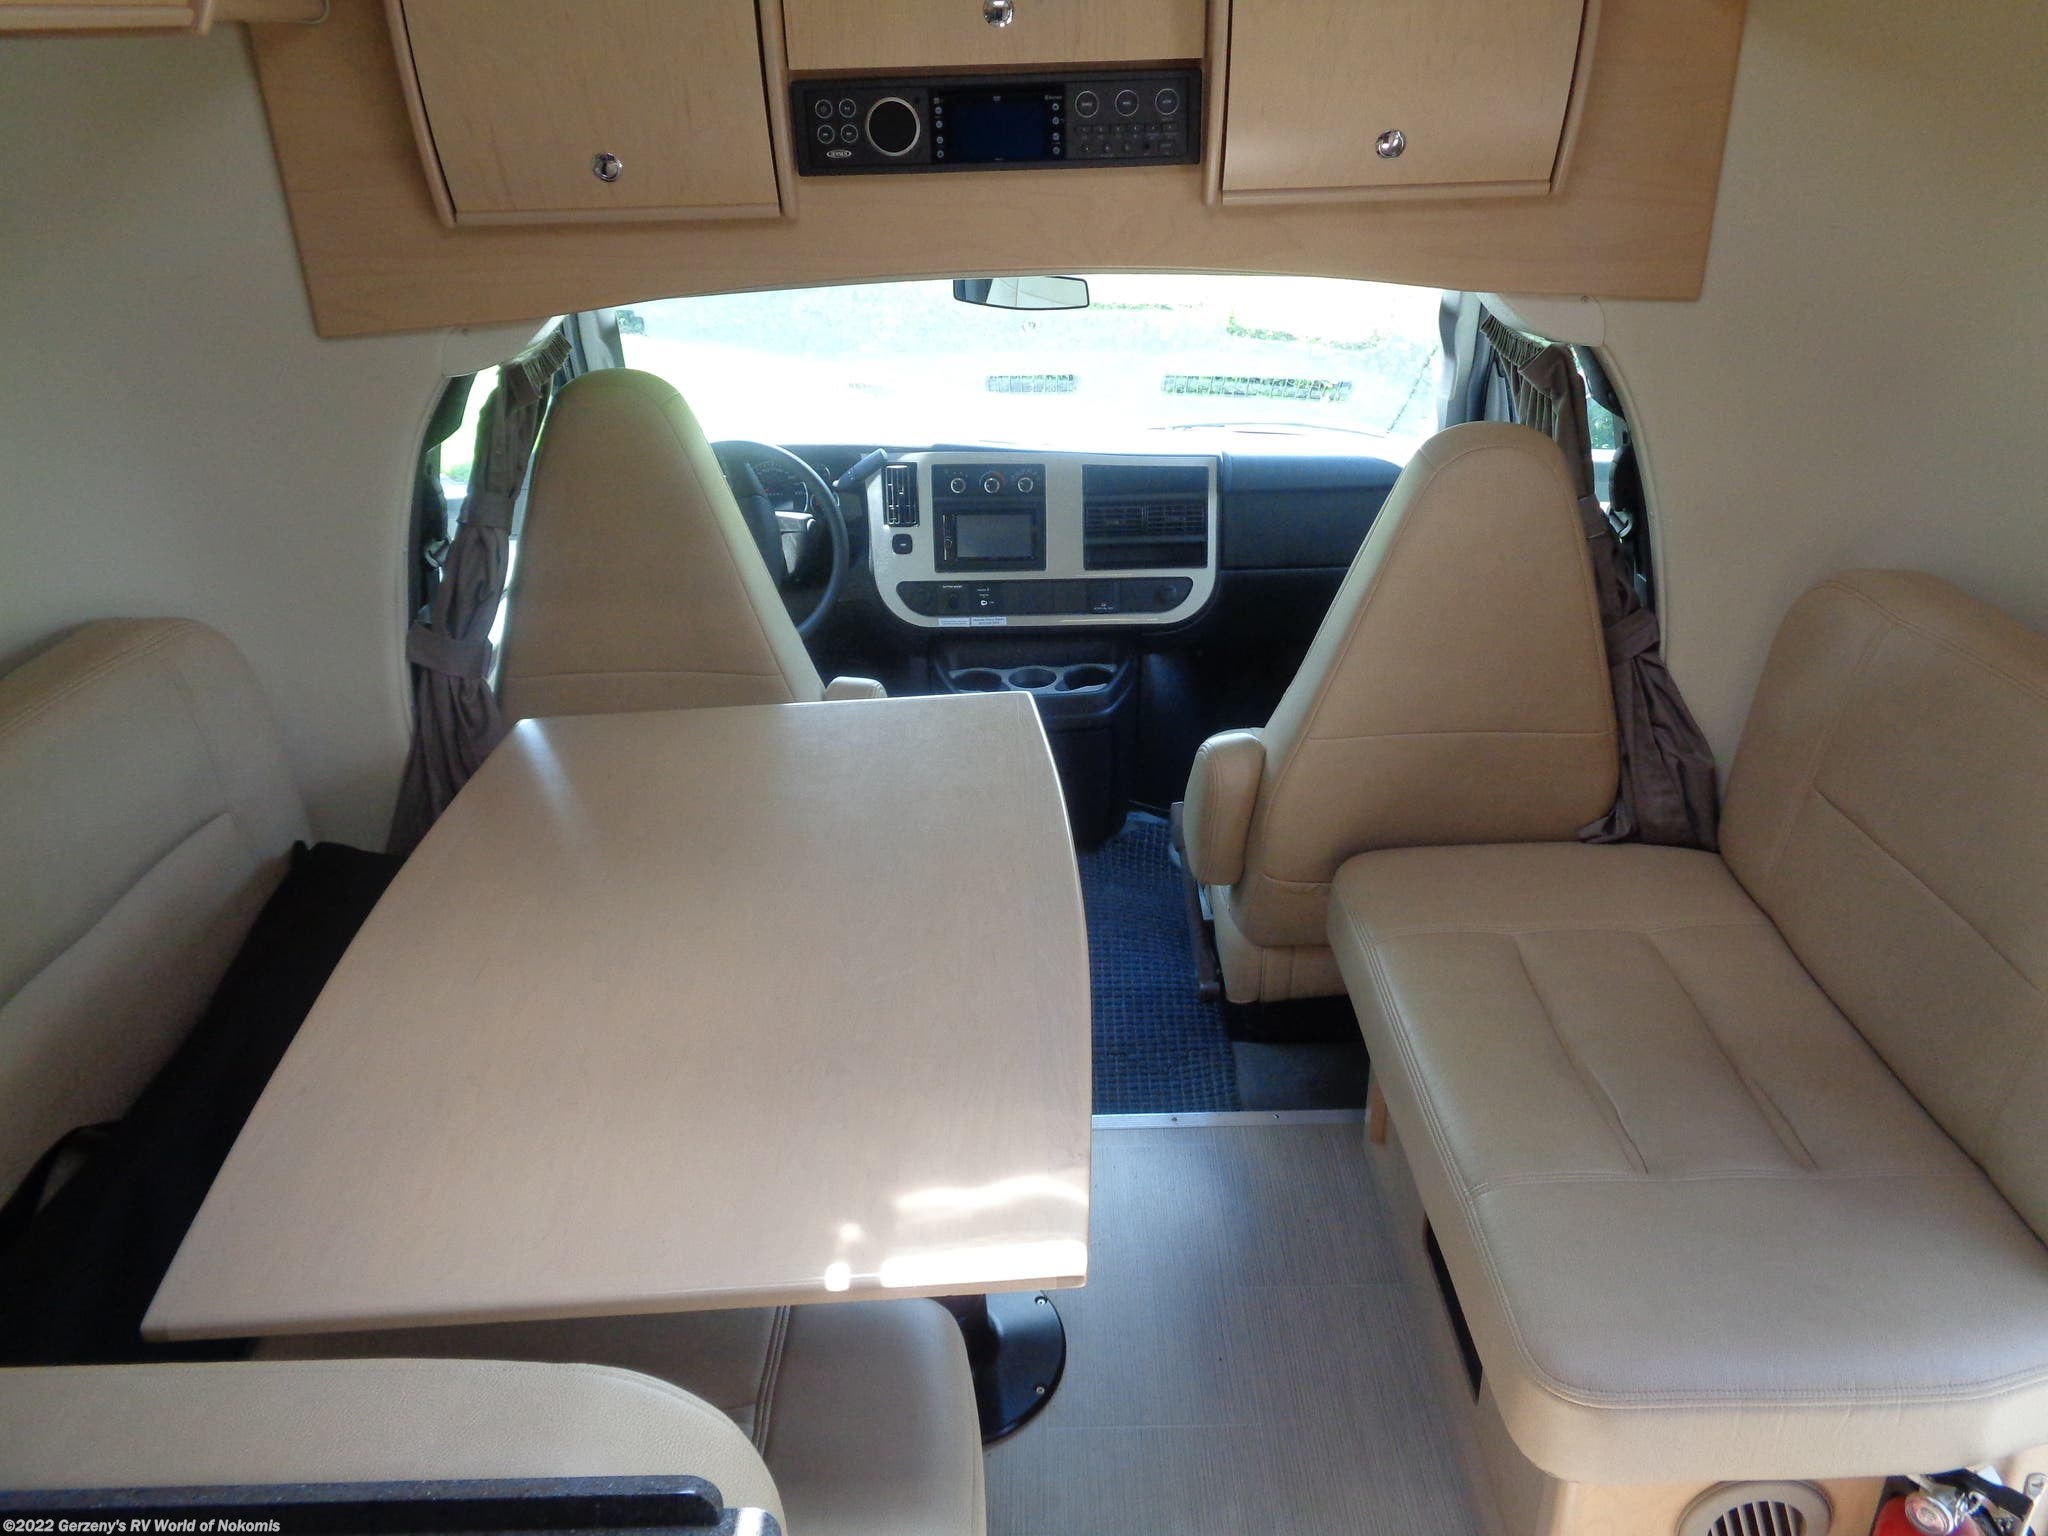 2016 Leisure Travel RV Libero for Sale in Nokomis FL